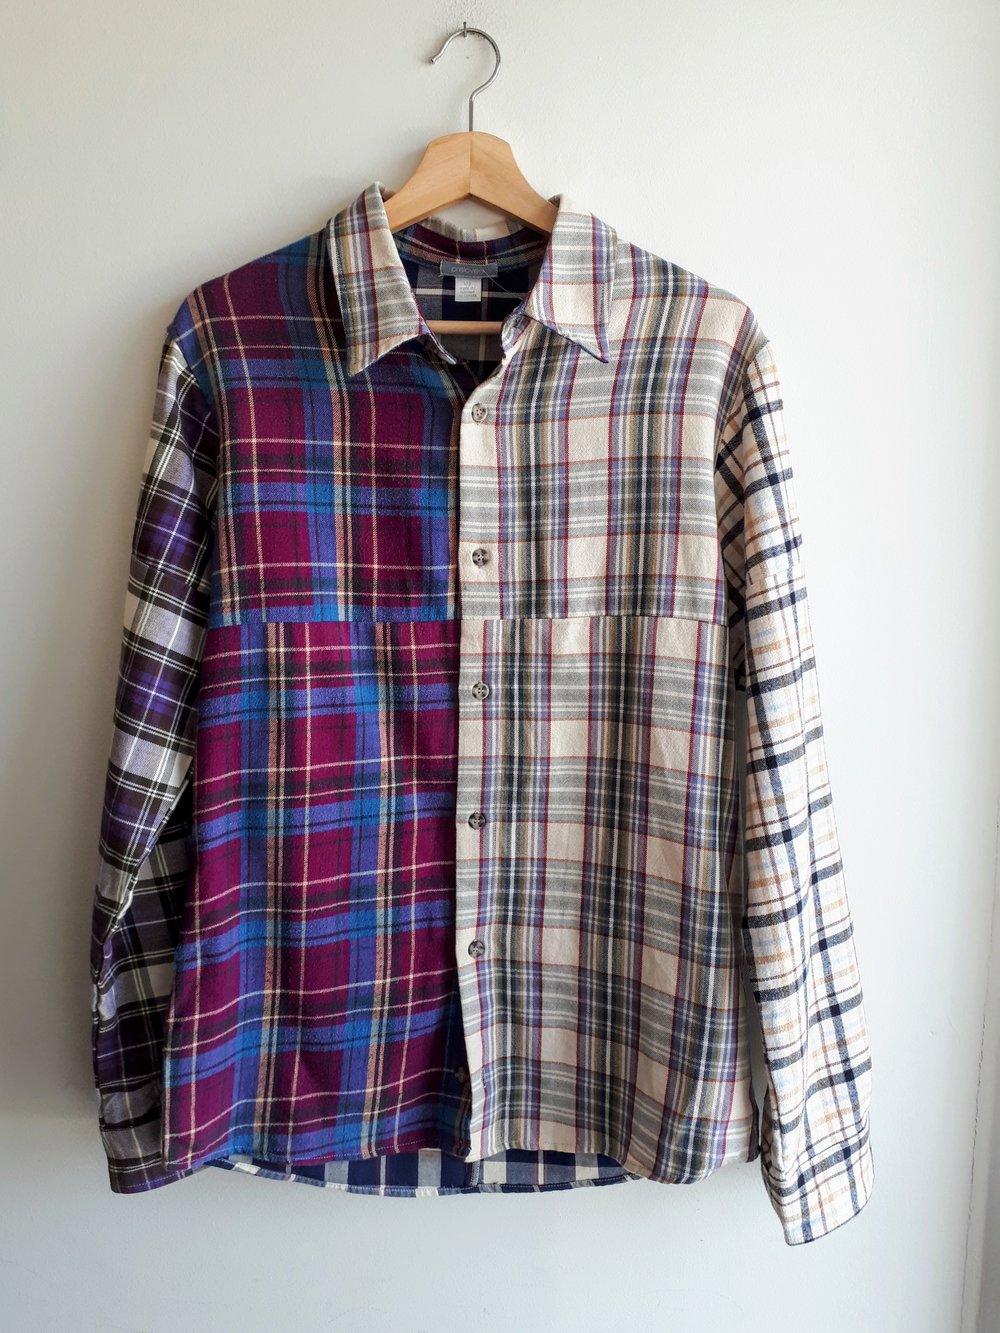 Preloved men's shirt; Size S, $36